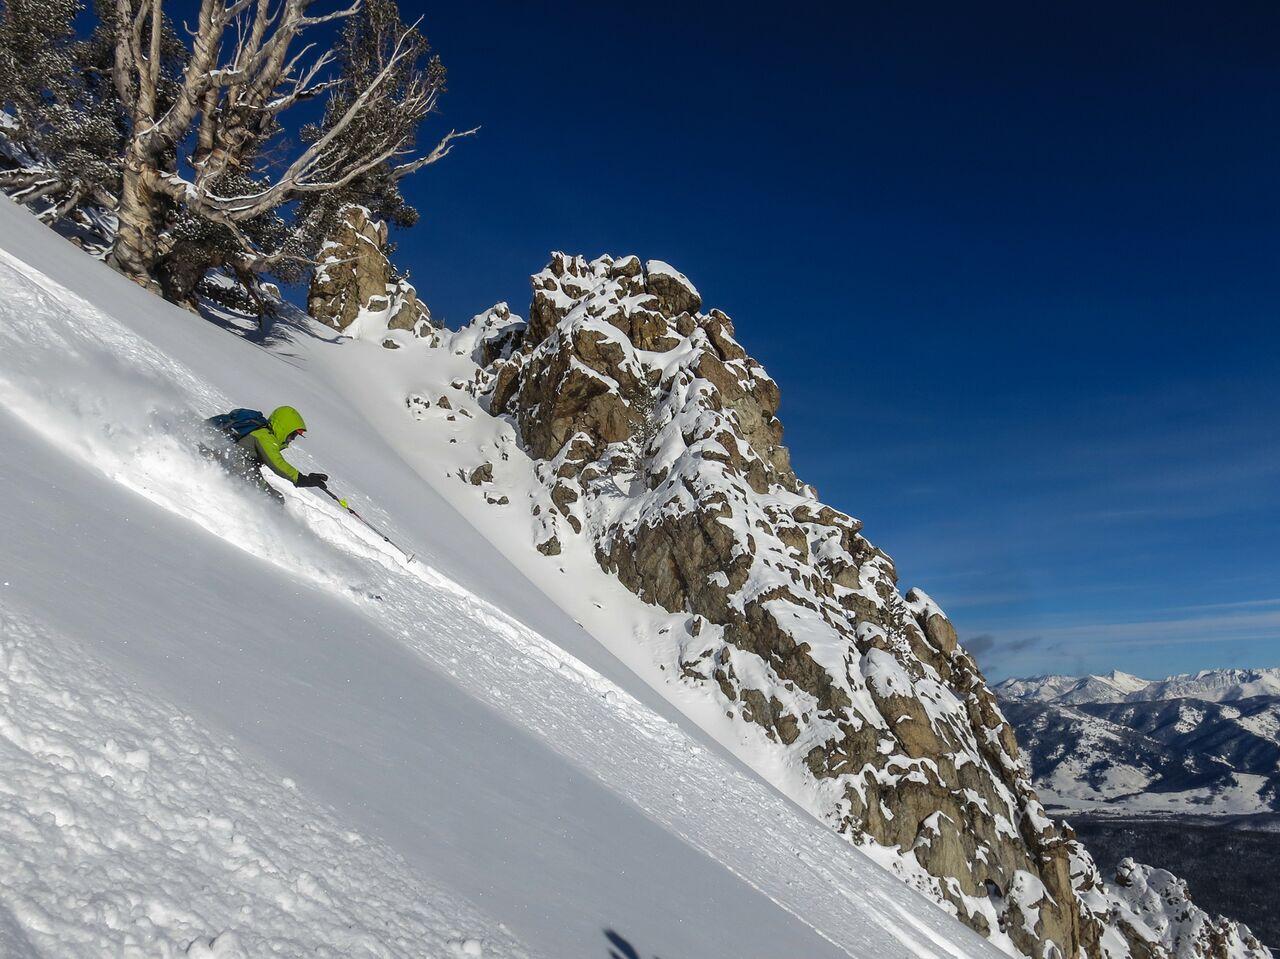 skiingdownhill.jpeg